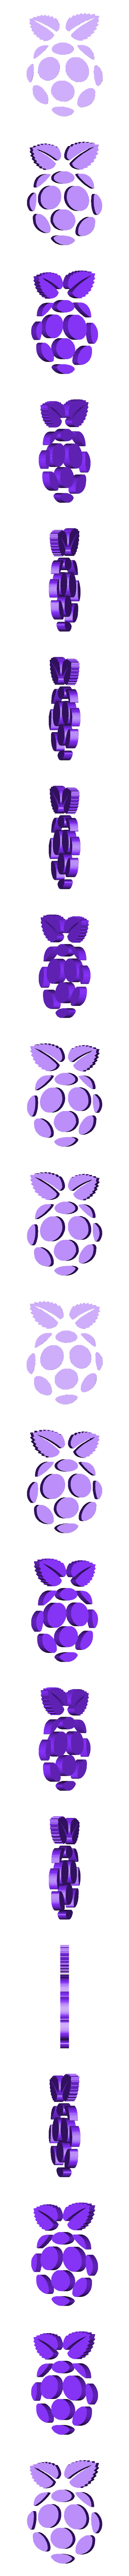 RaspberryLogo_fixed-sharp-edge.stl Download free STL file Raspberry Pi Logo - Fixed • Design to 3D print, Lammesky